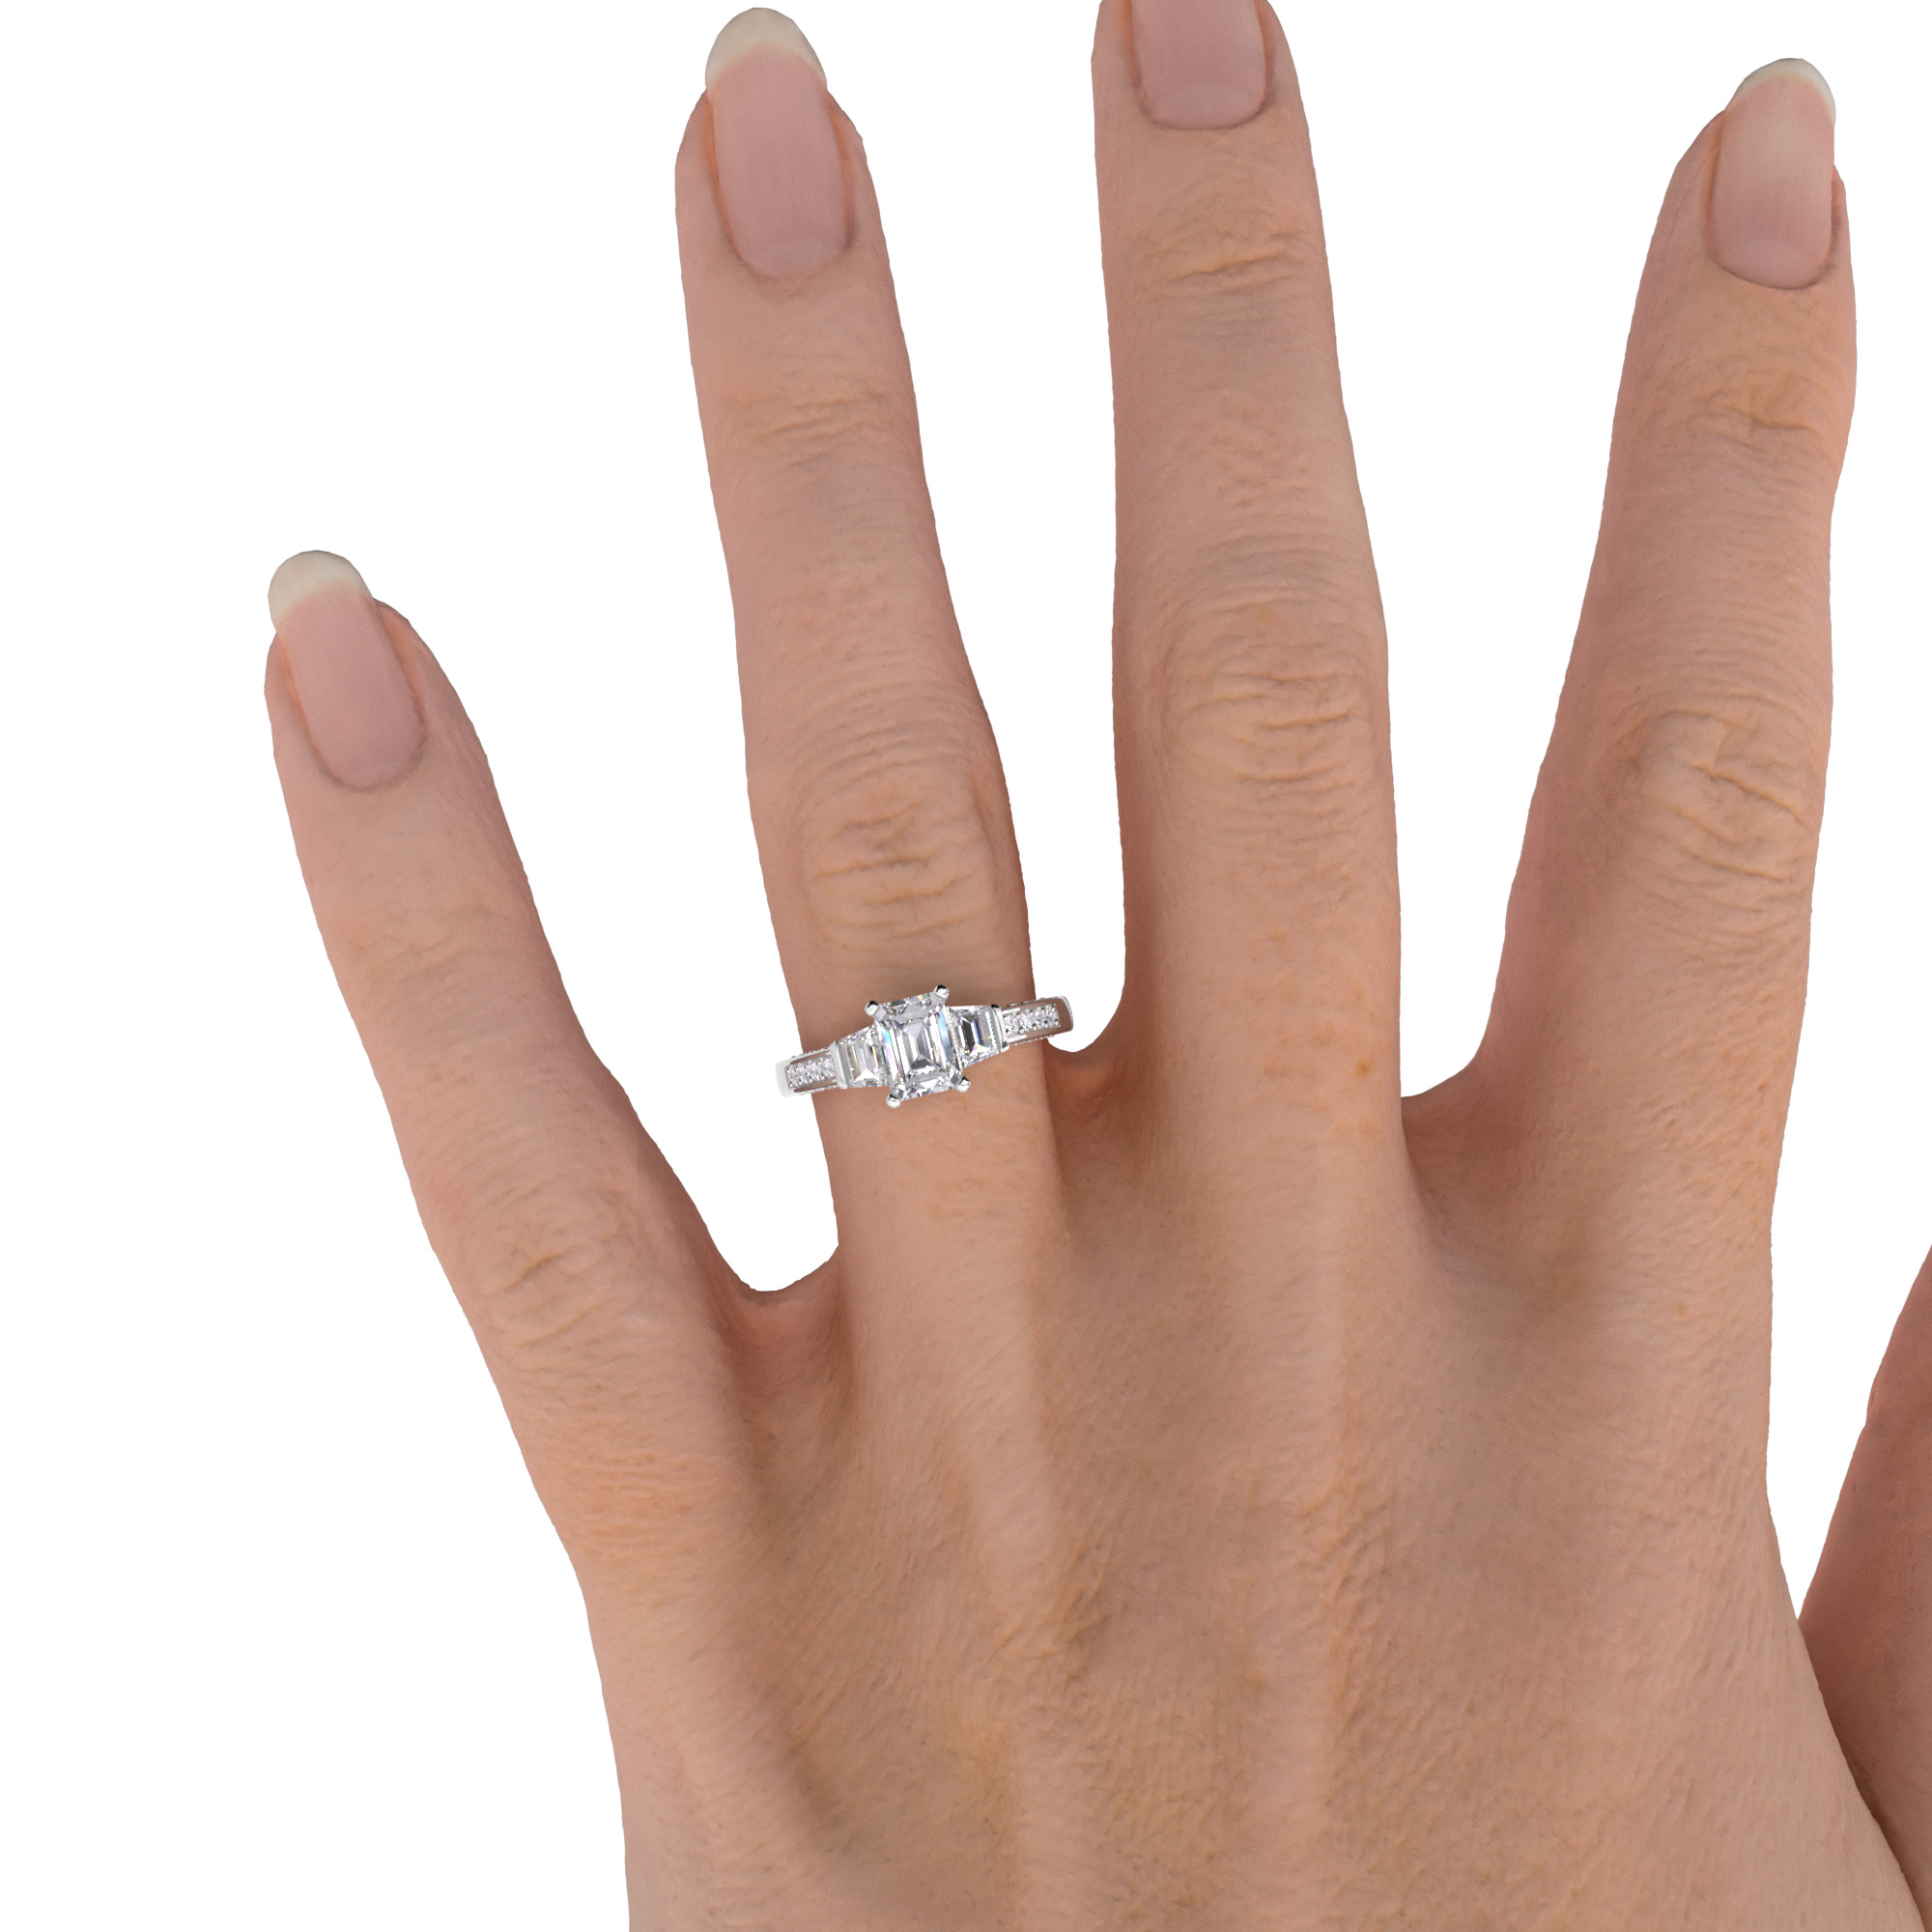 Inel de Logodna cu 3 Diamante Dama Aur Alb 18kt, cu un Diamant Central Taietura Smarald cu 2 Diamante Forma Trapez pe Margini si Diamante Mici Rotund Briliant pe Lateral-img1